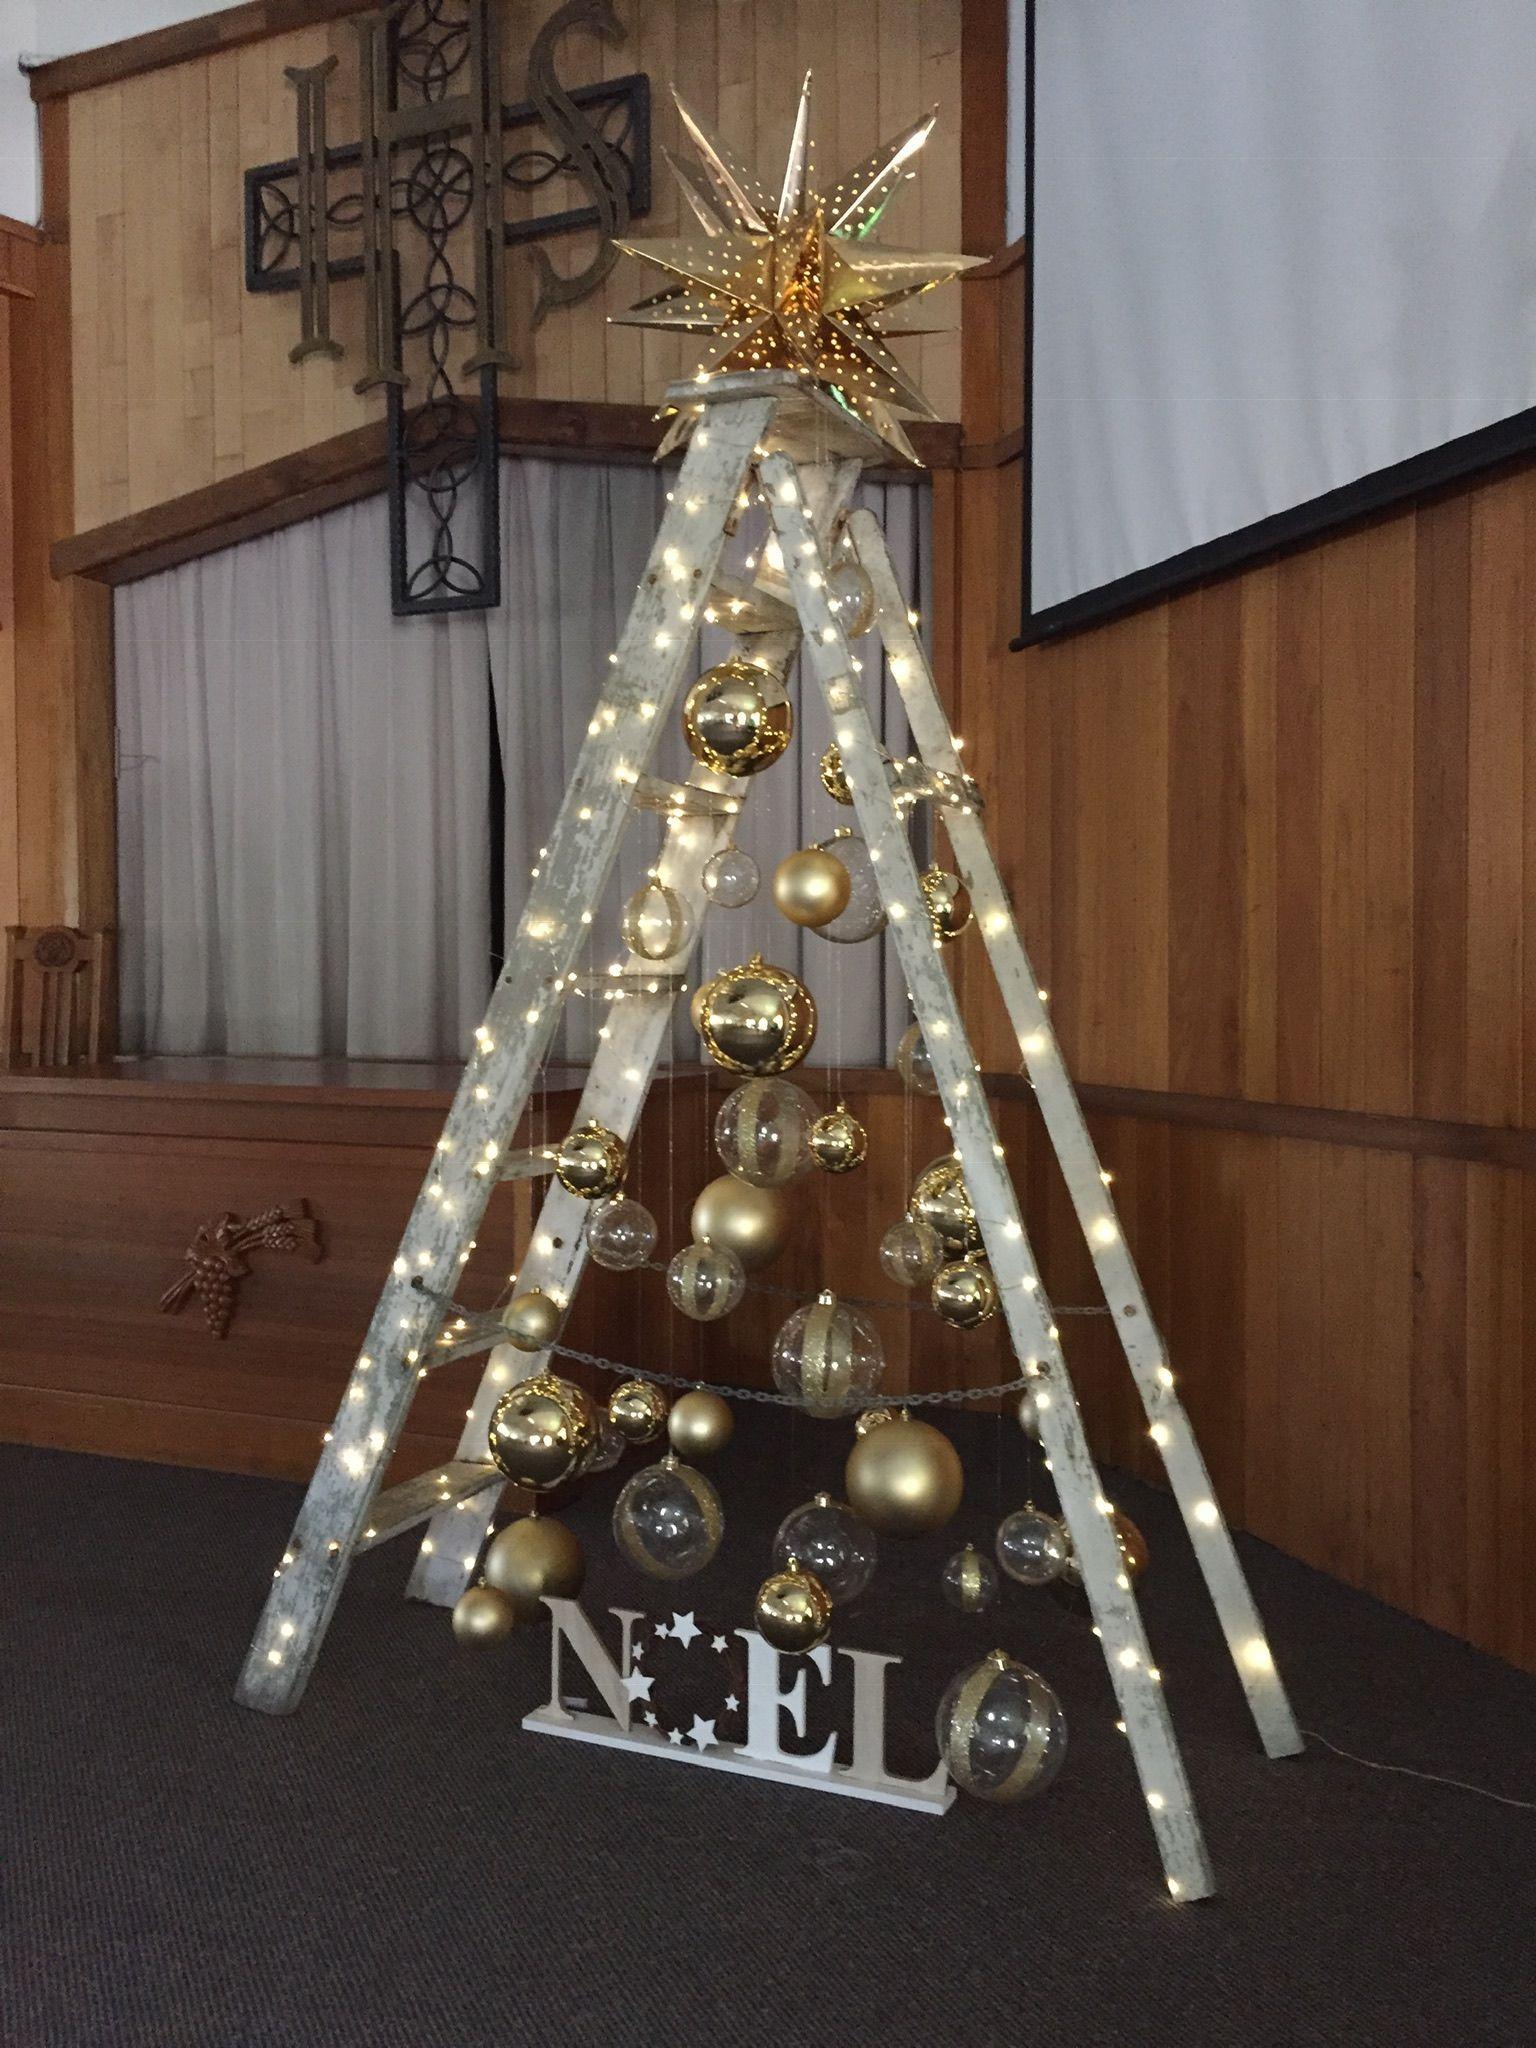 Ladder Christmas Tree by Toni Williams #weihnachtlicheszuhause Ladder Christmas Tree by Toni Williams #christmastreeideas